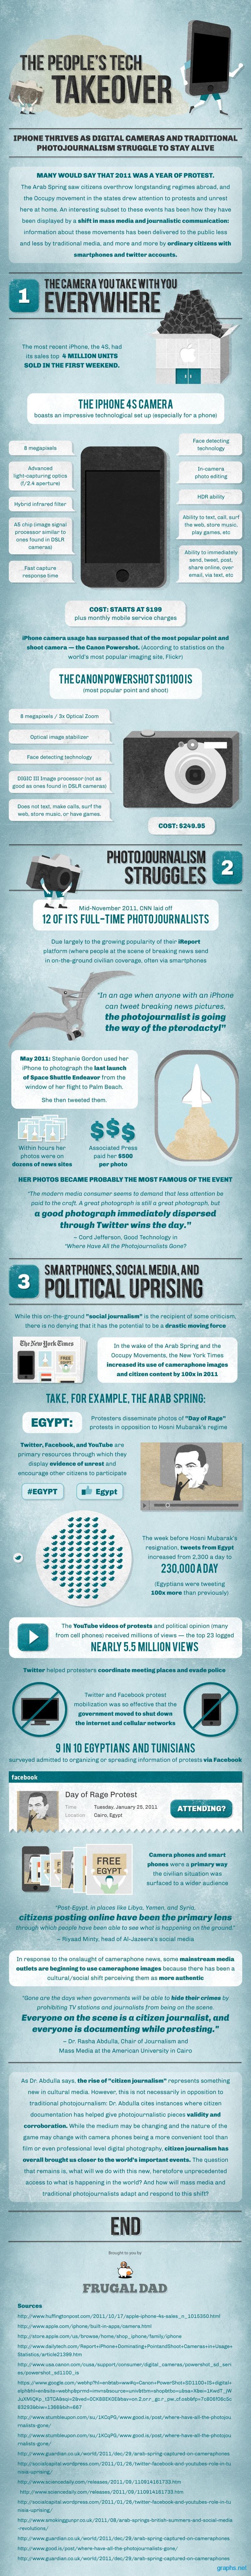 Photojournalism Iphone Infographic